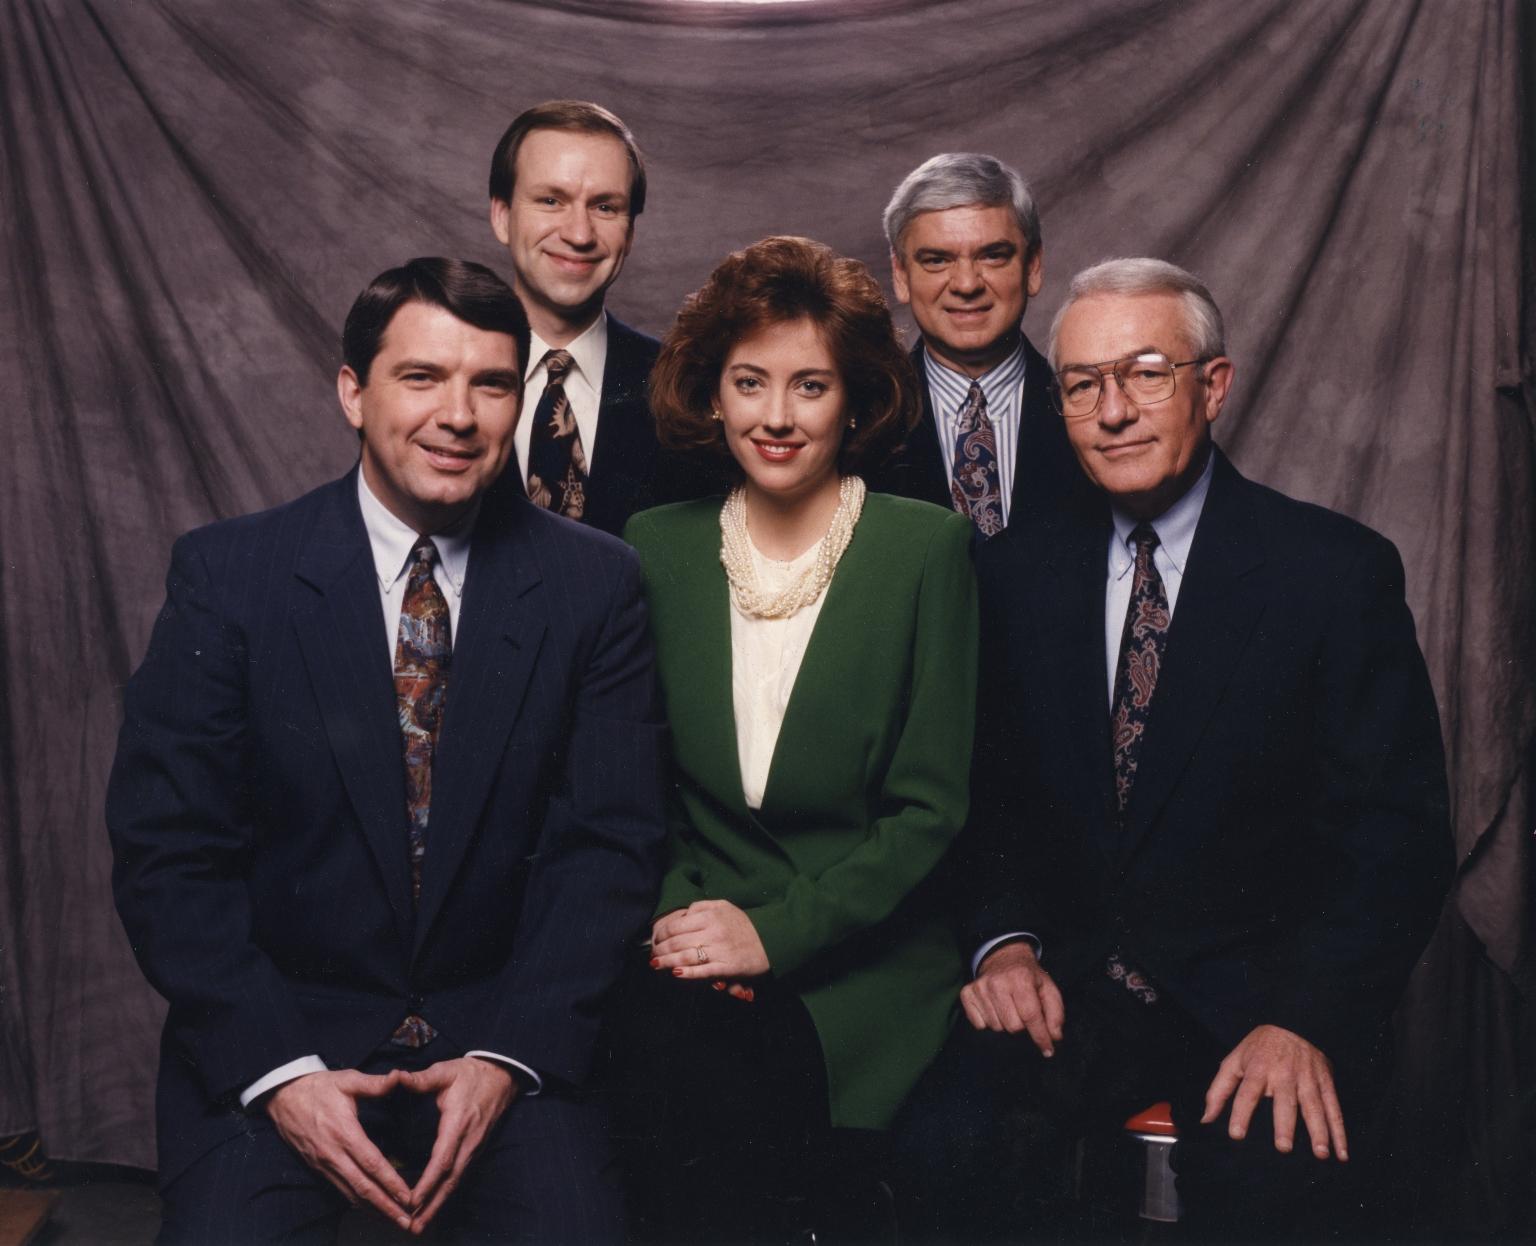 Reporter/anchor Ron Beaton, reporter/anchor Kim Keelor, news vice-president/anchor Tom Butler, meteorologist Cal Sisto, sports director/anchor Larry McIntosh